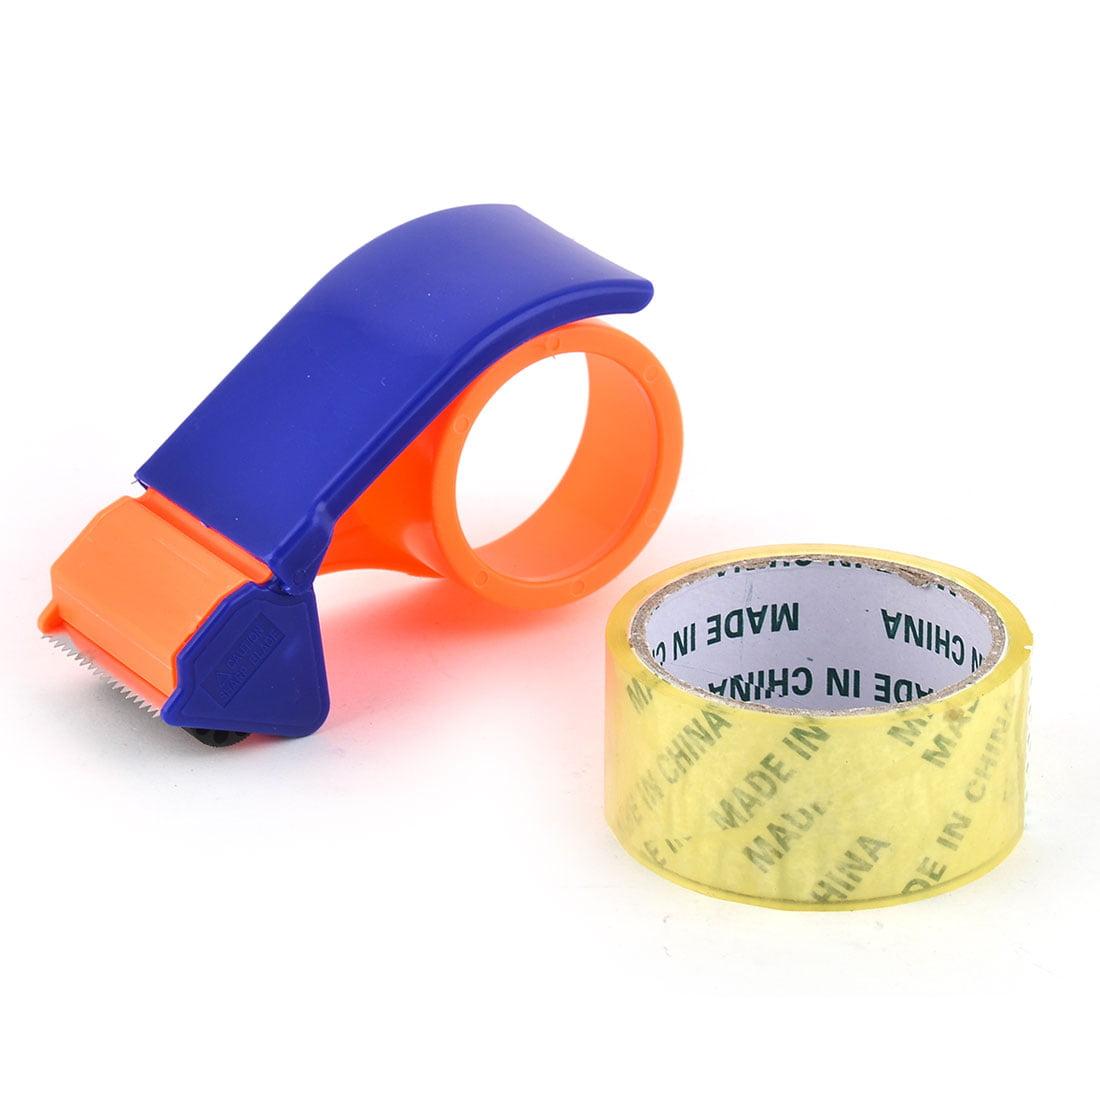 Stationary Desk Roll Holder Sealing Packing Packaging Tape Cutter Dispenser Set